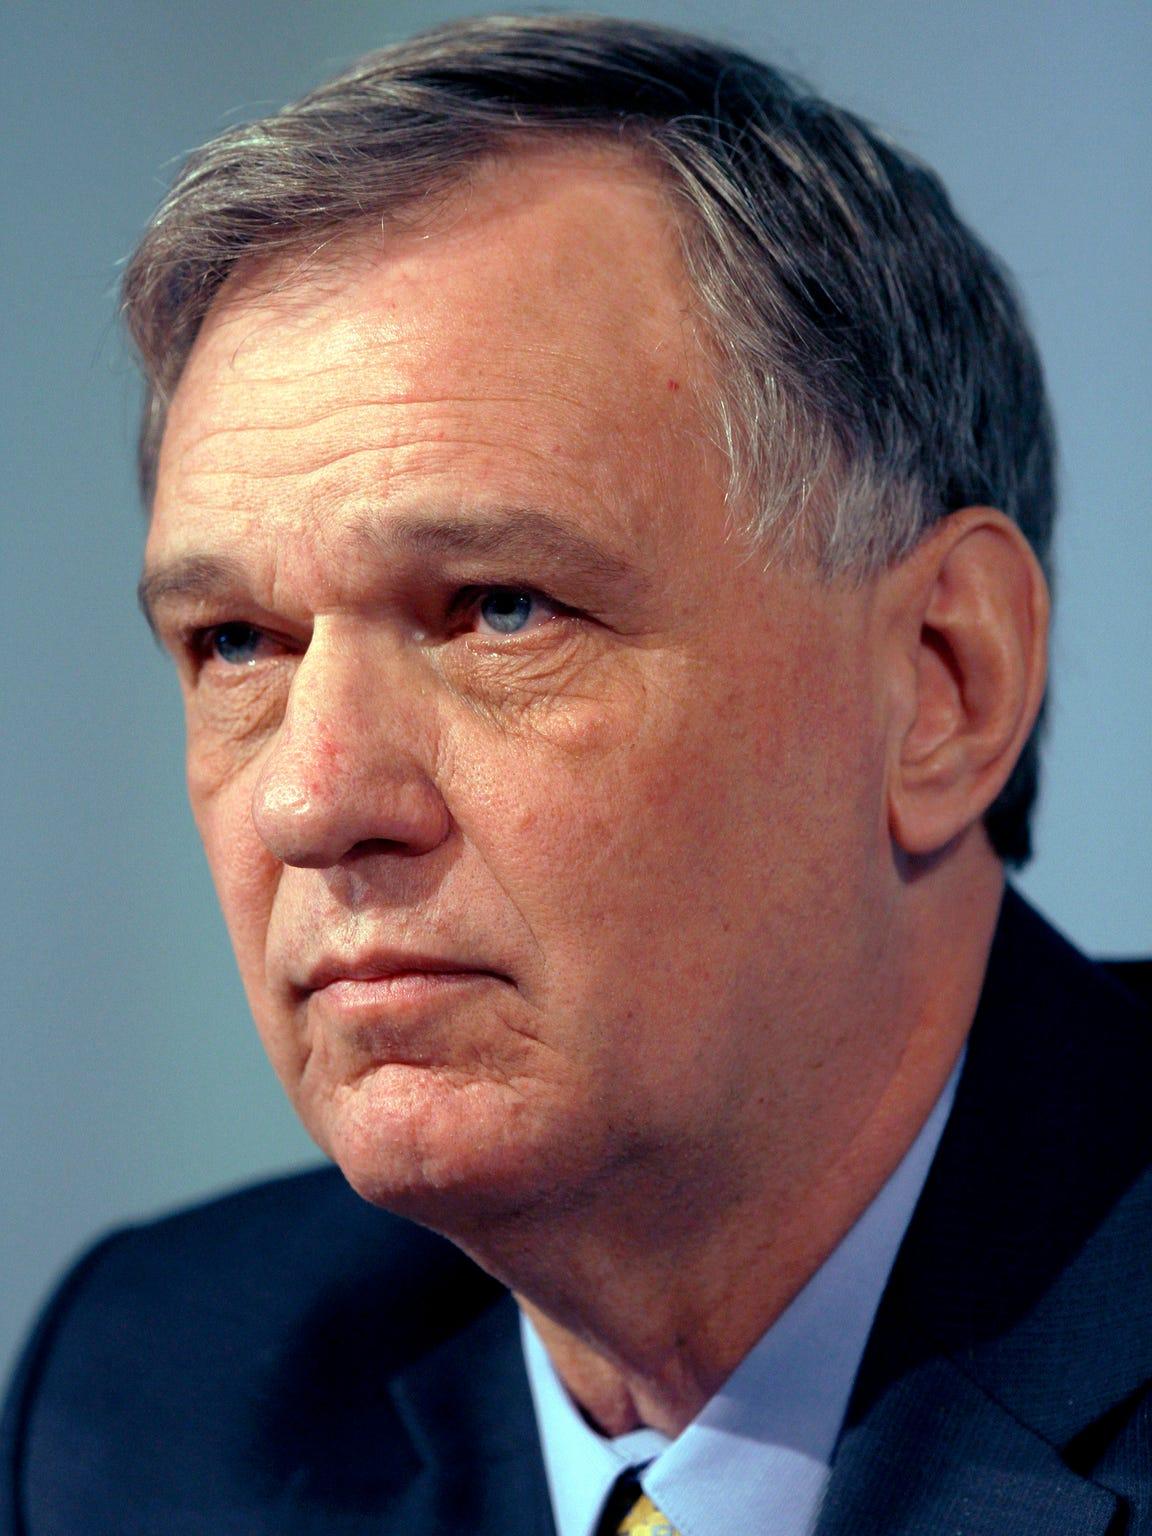 John Hanger was the DEP Secretary under Gov. Edward Rendell and now works in Gov. Tom Wolf's administration.